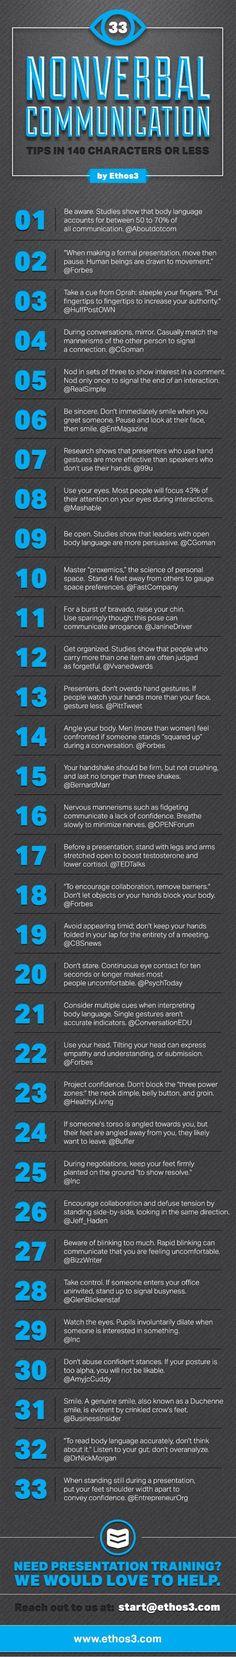 Psychology : 33 consejos sobre comunicación no verbal en 140 caracteres